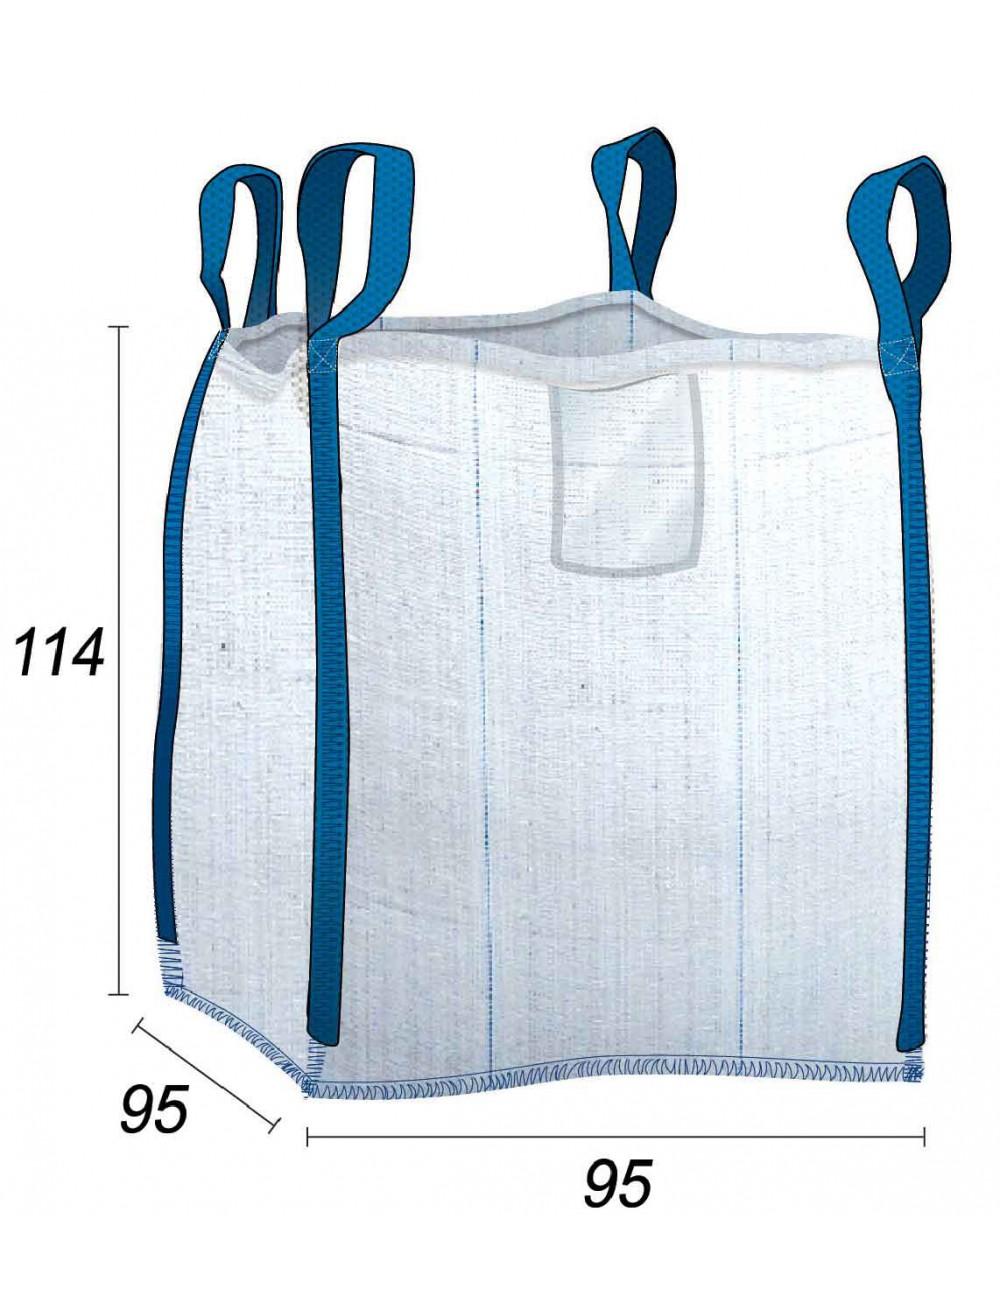 Big Bag Filtrazione convenzionale dei fanghi - 91X91X110